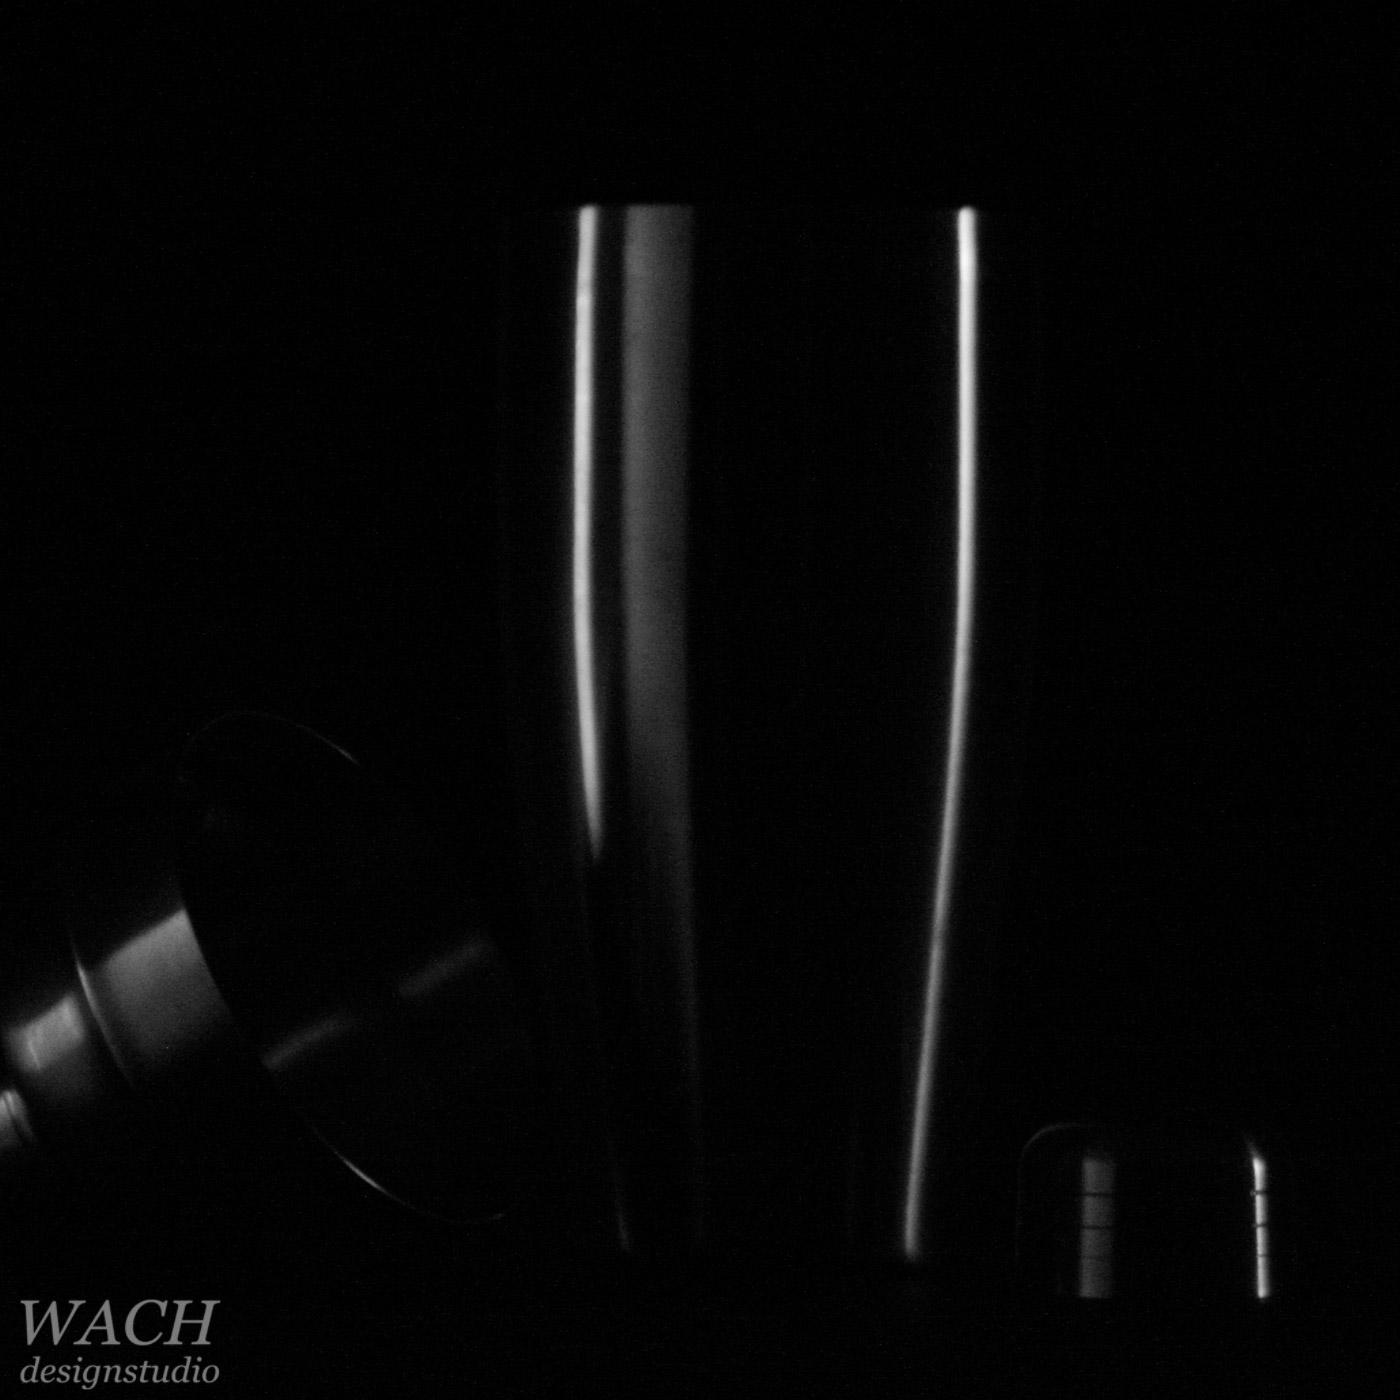 Shaker photograph using minimal light setup